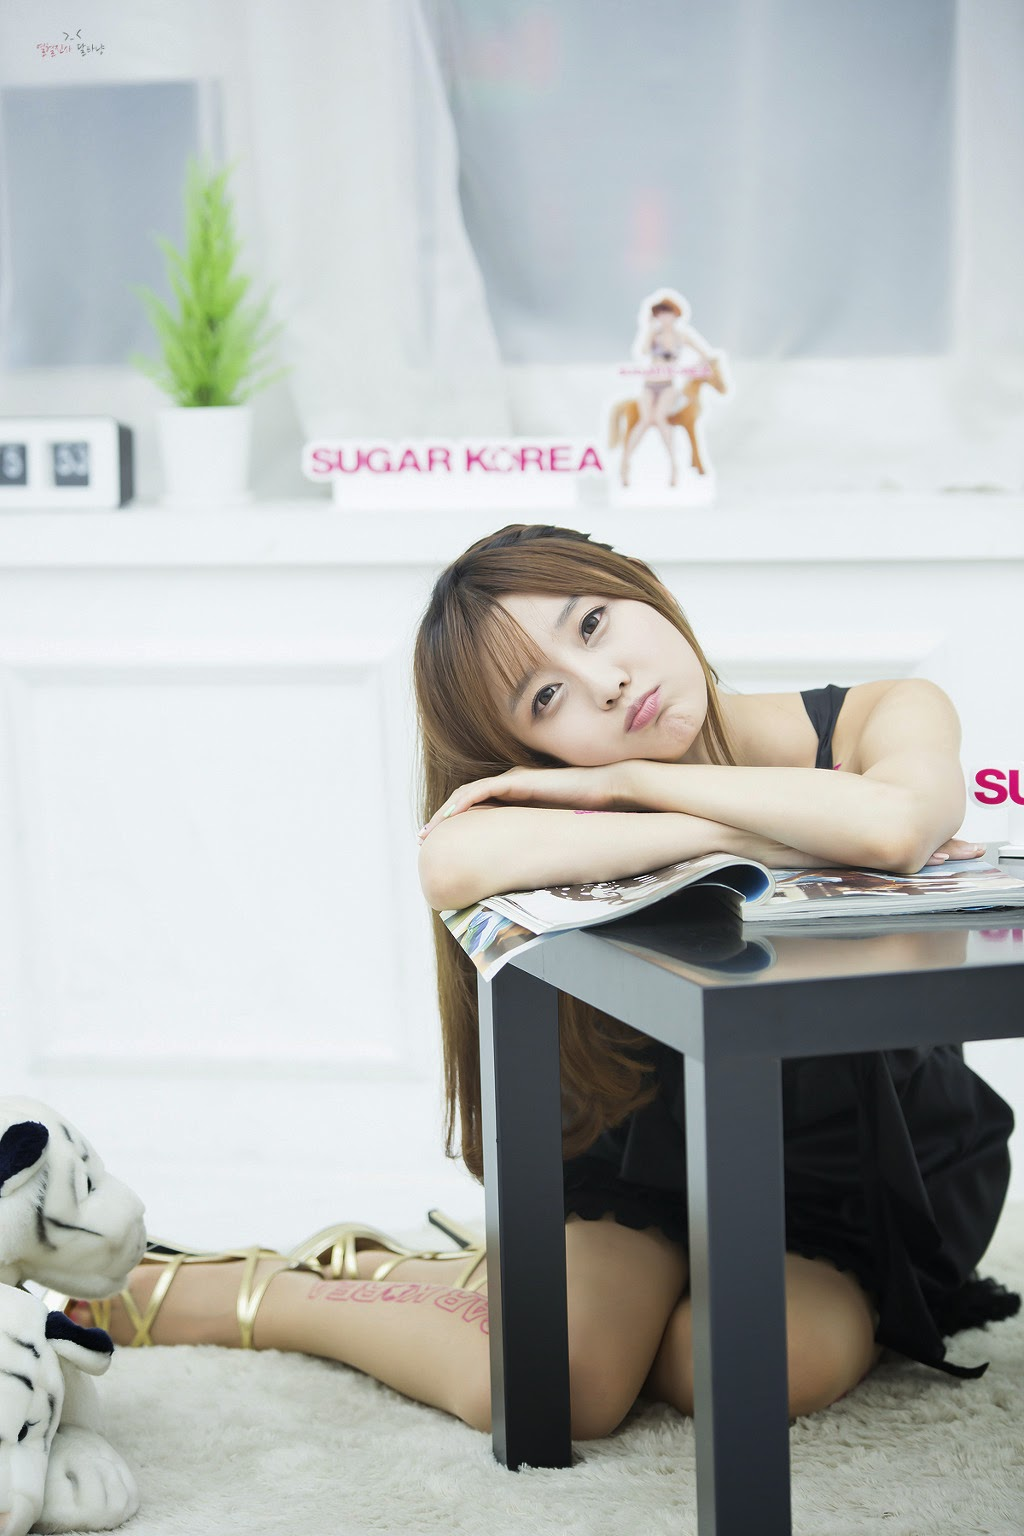 how to say sugar in korean